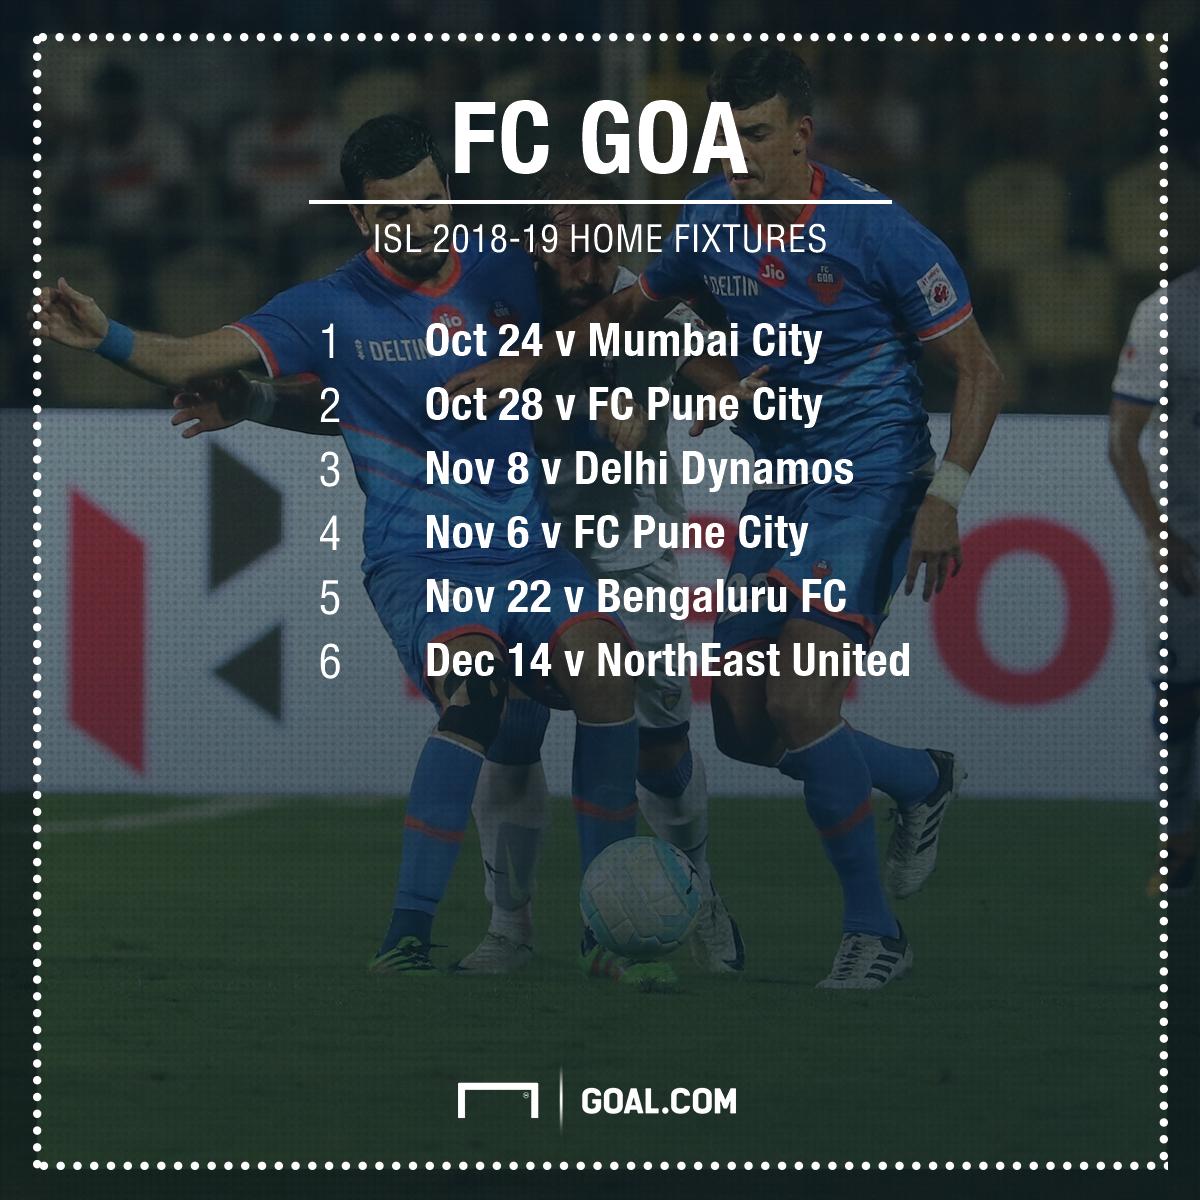 ISl 2018-19 FC Goa fixtures home